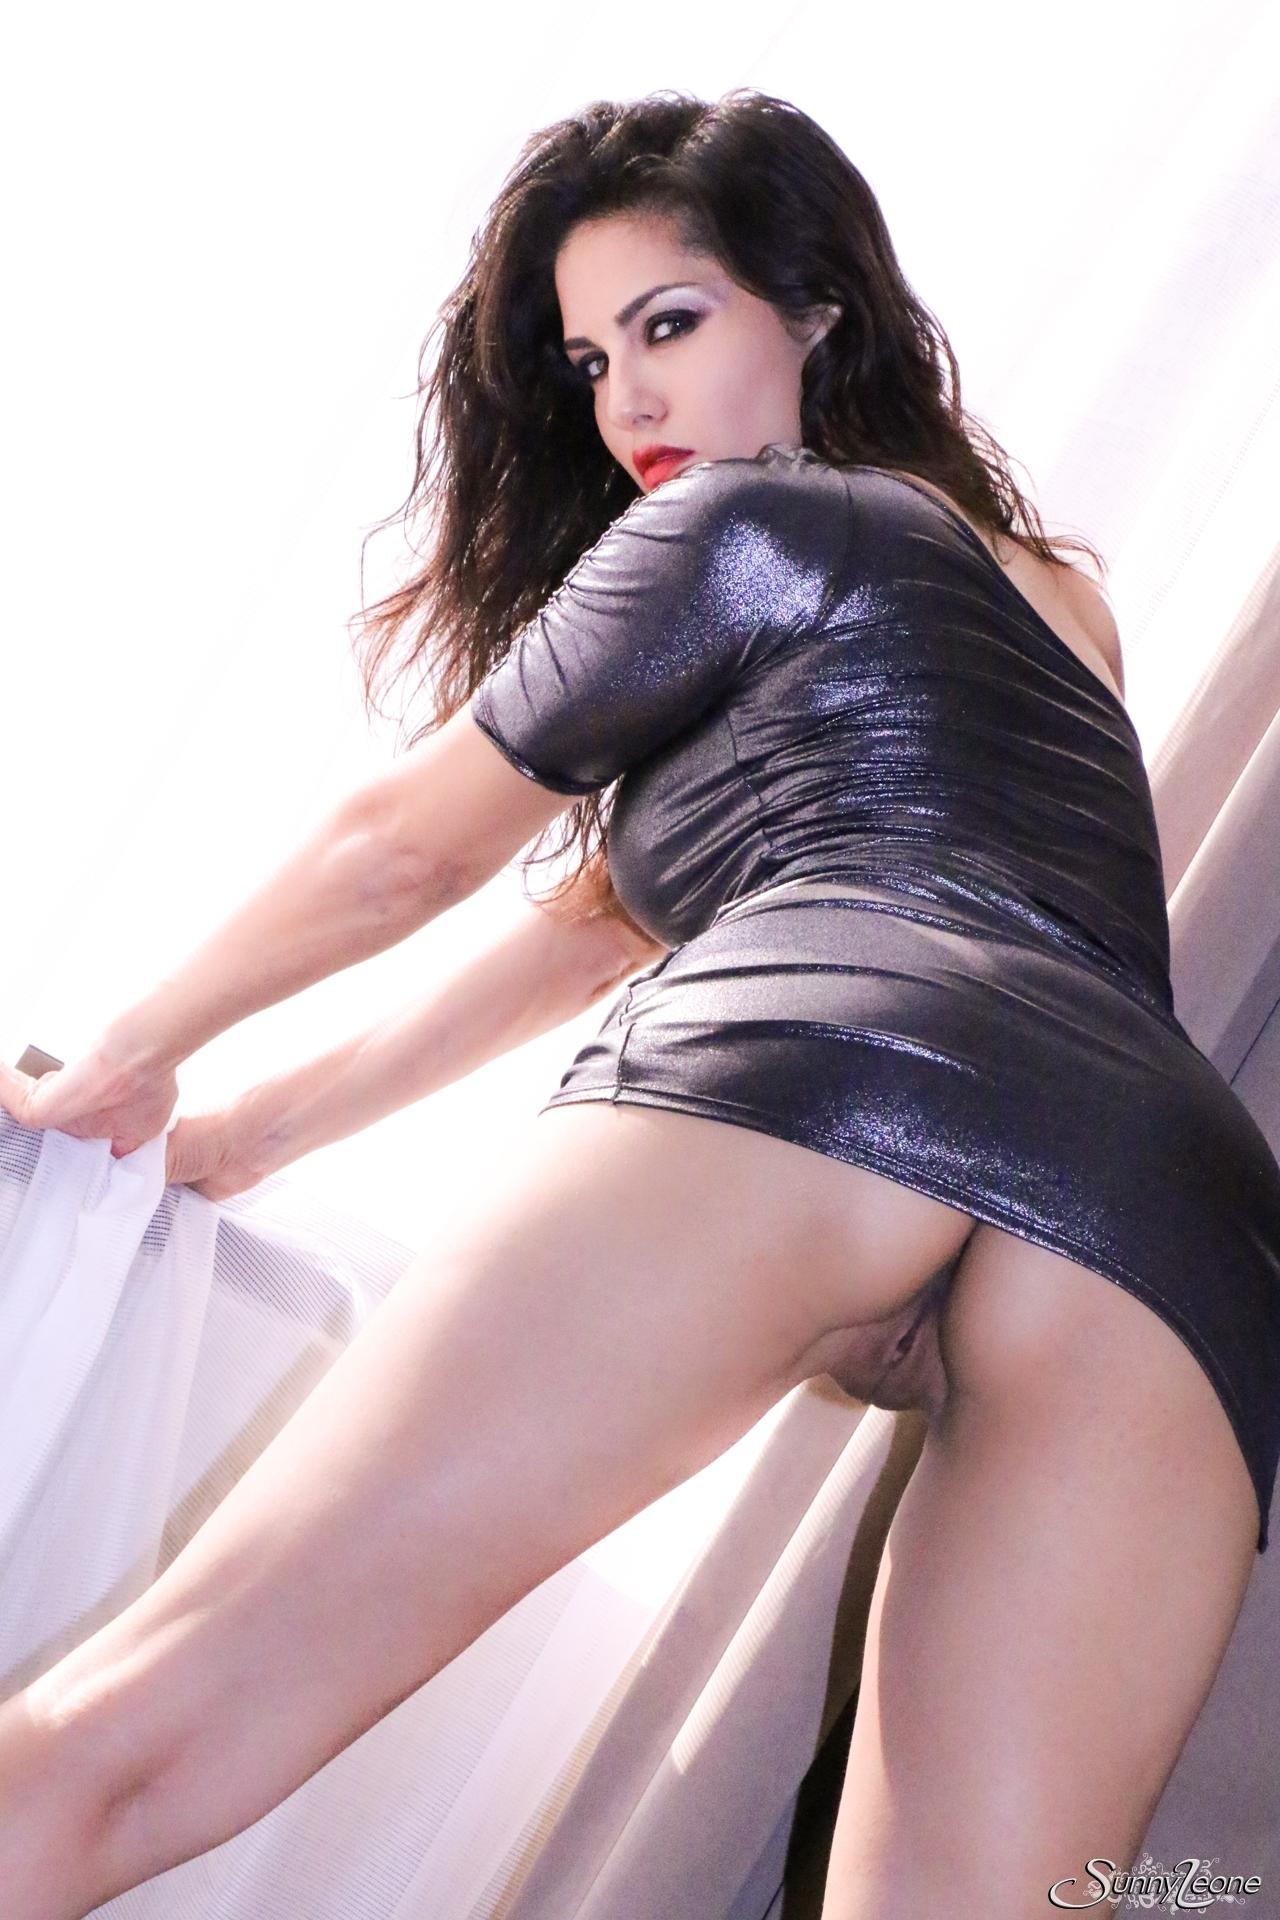 blazingmovies pic teasers 51891 df88a63ff3 nude 01 51891 04